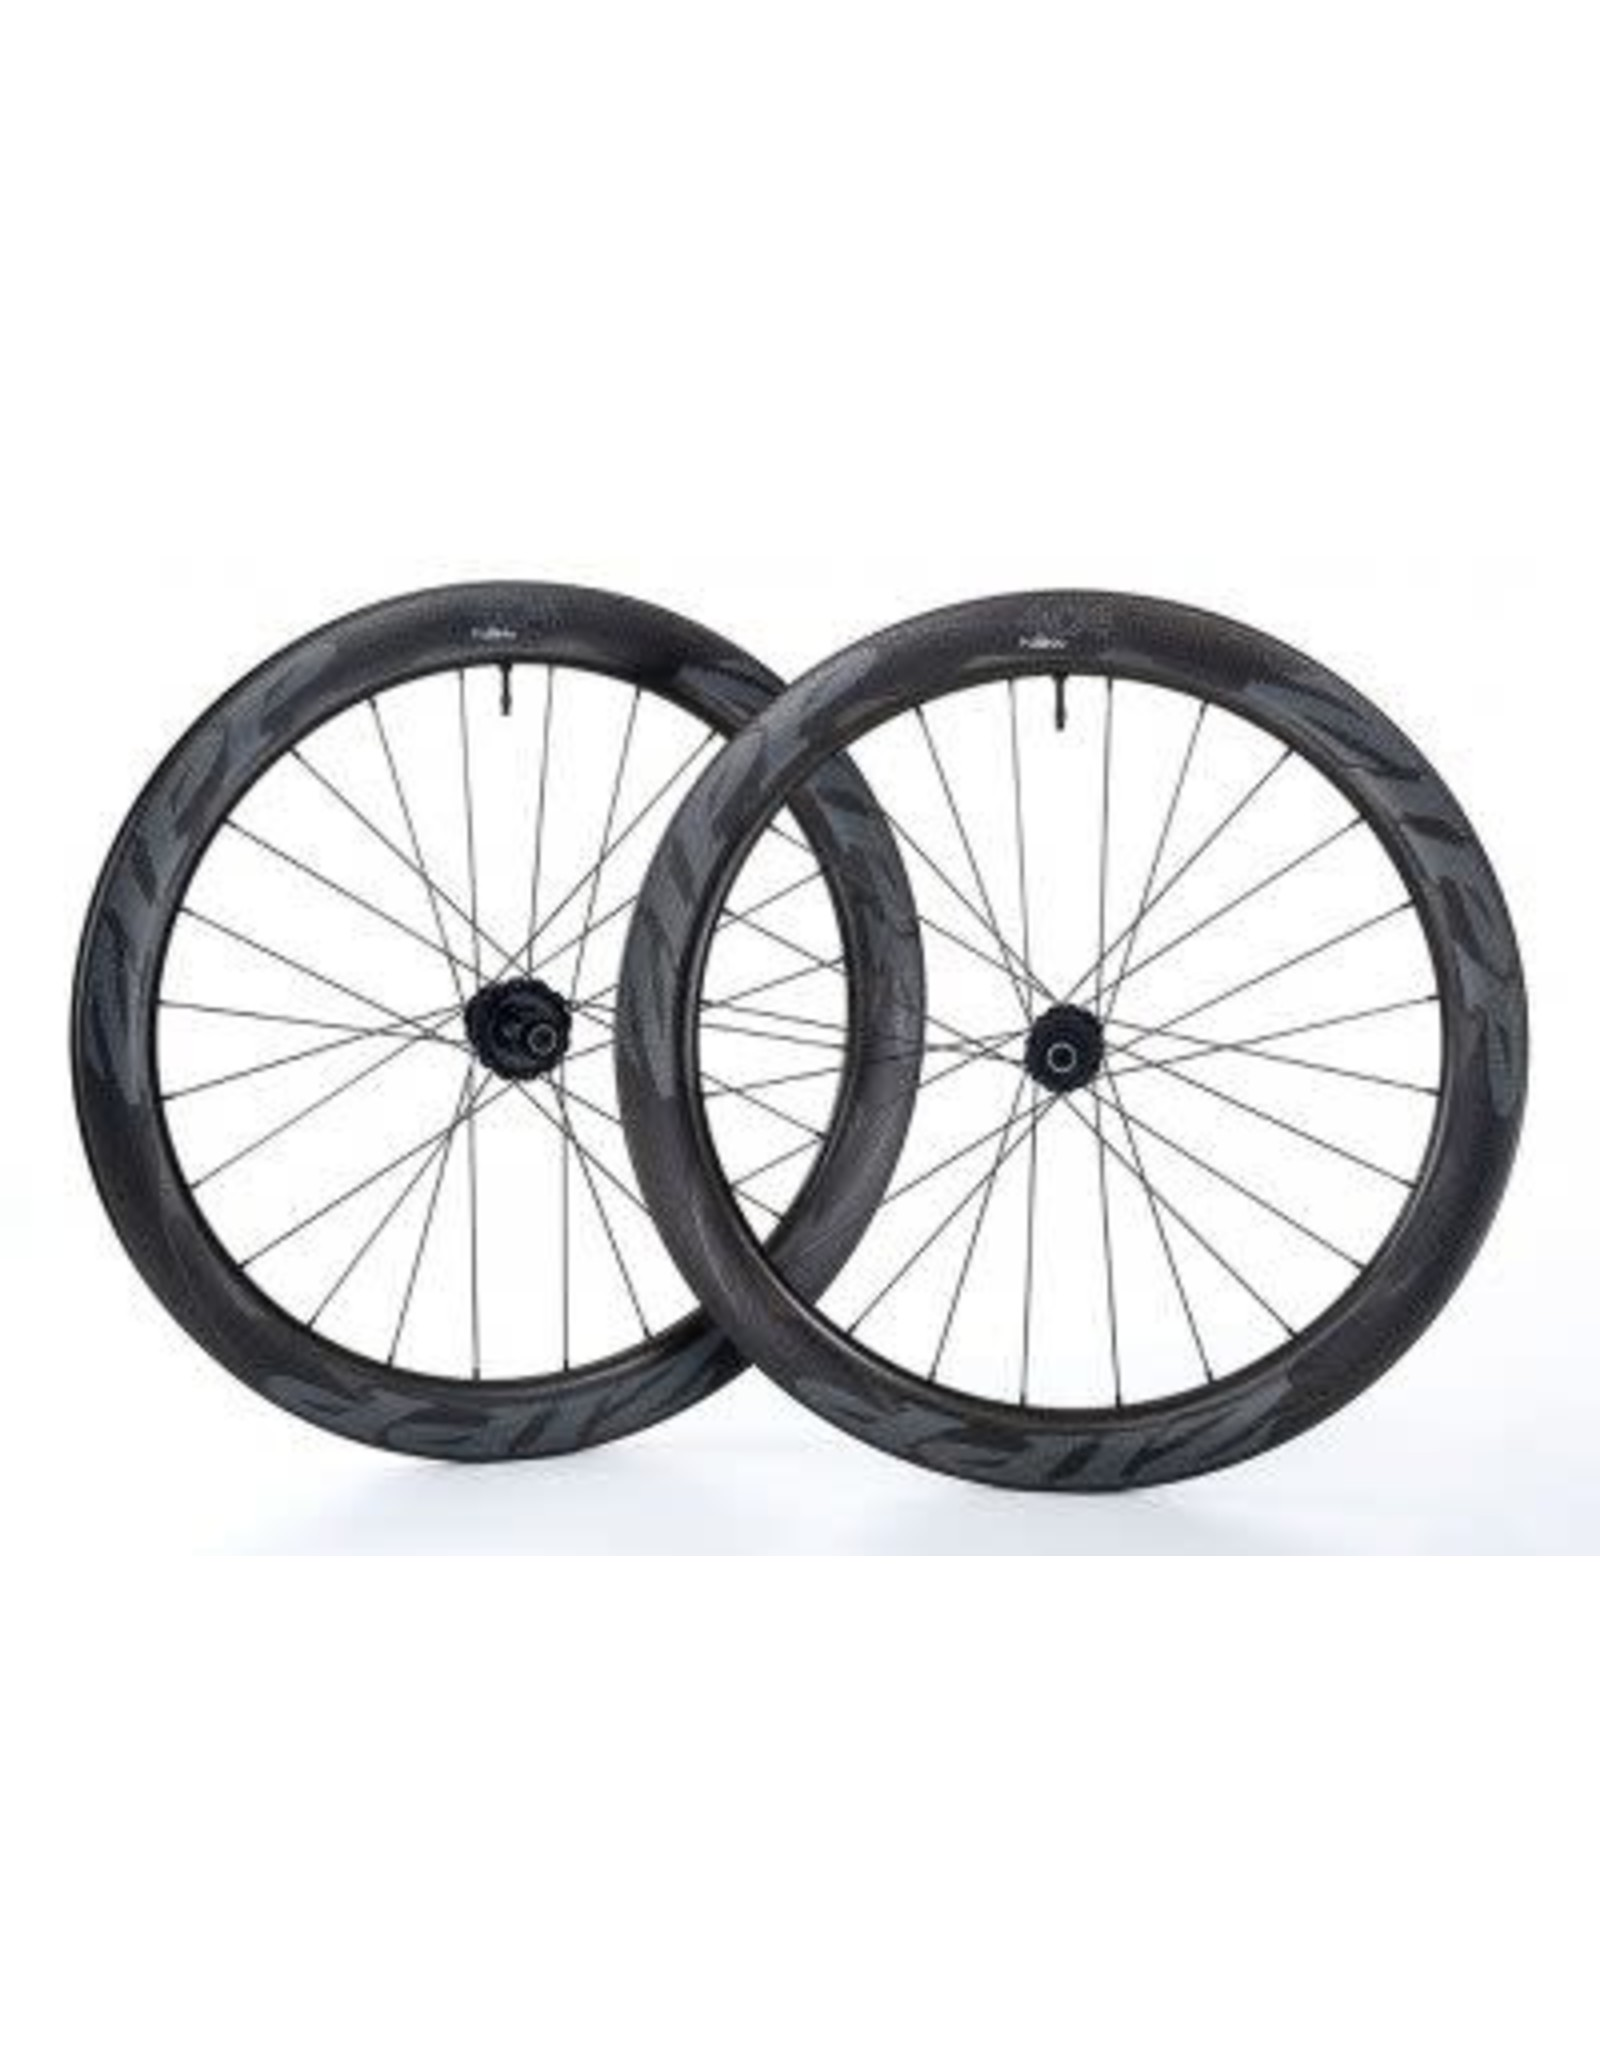 Zipp ZIPP, 404 NSW, Disc Wheelset, Shimano, CL